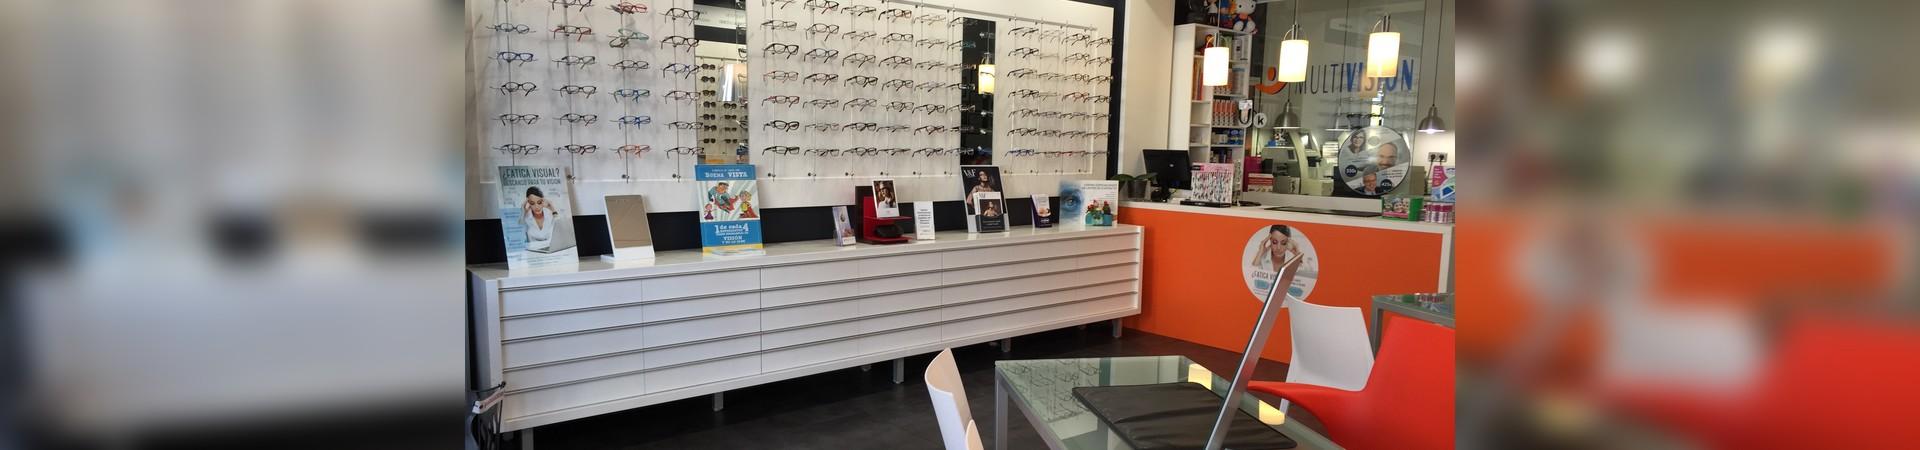 optica alcobendas, multivision, optometria alcobendas